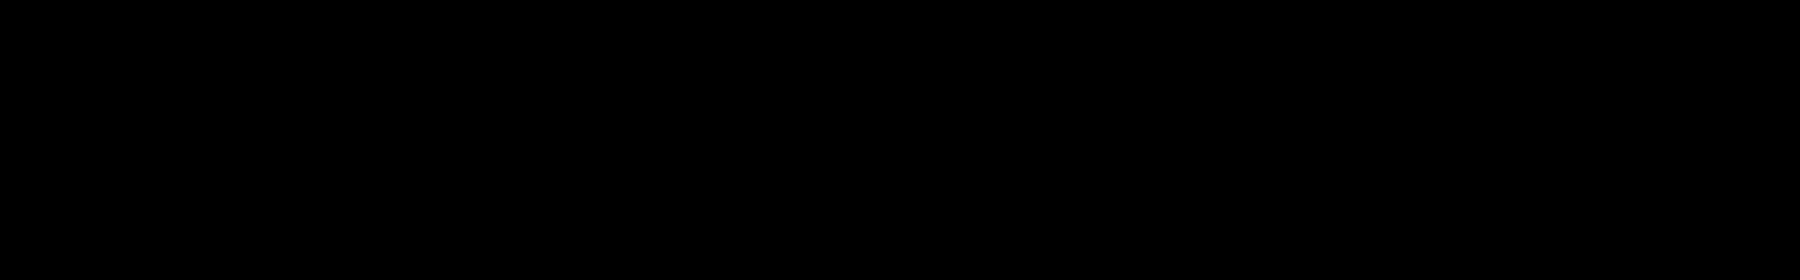 Sylenth1 Dub Tech audio waveform